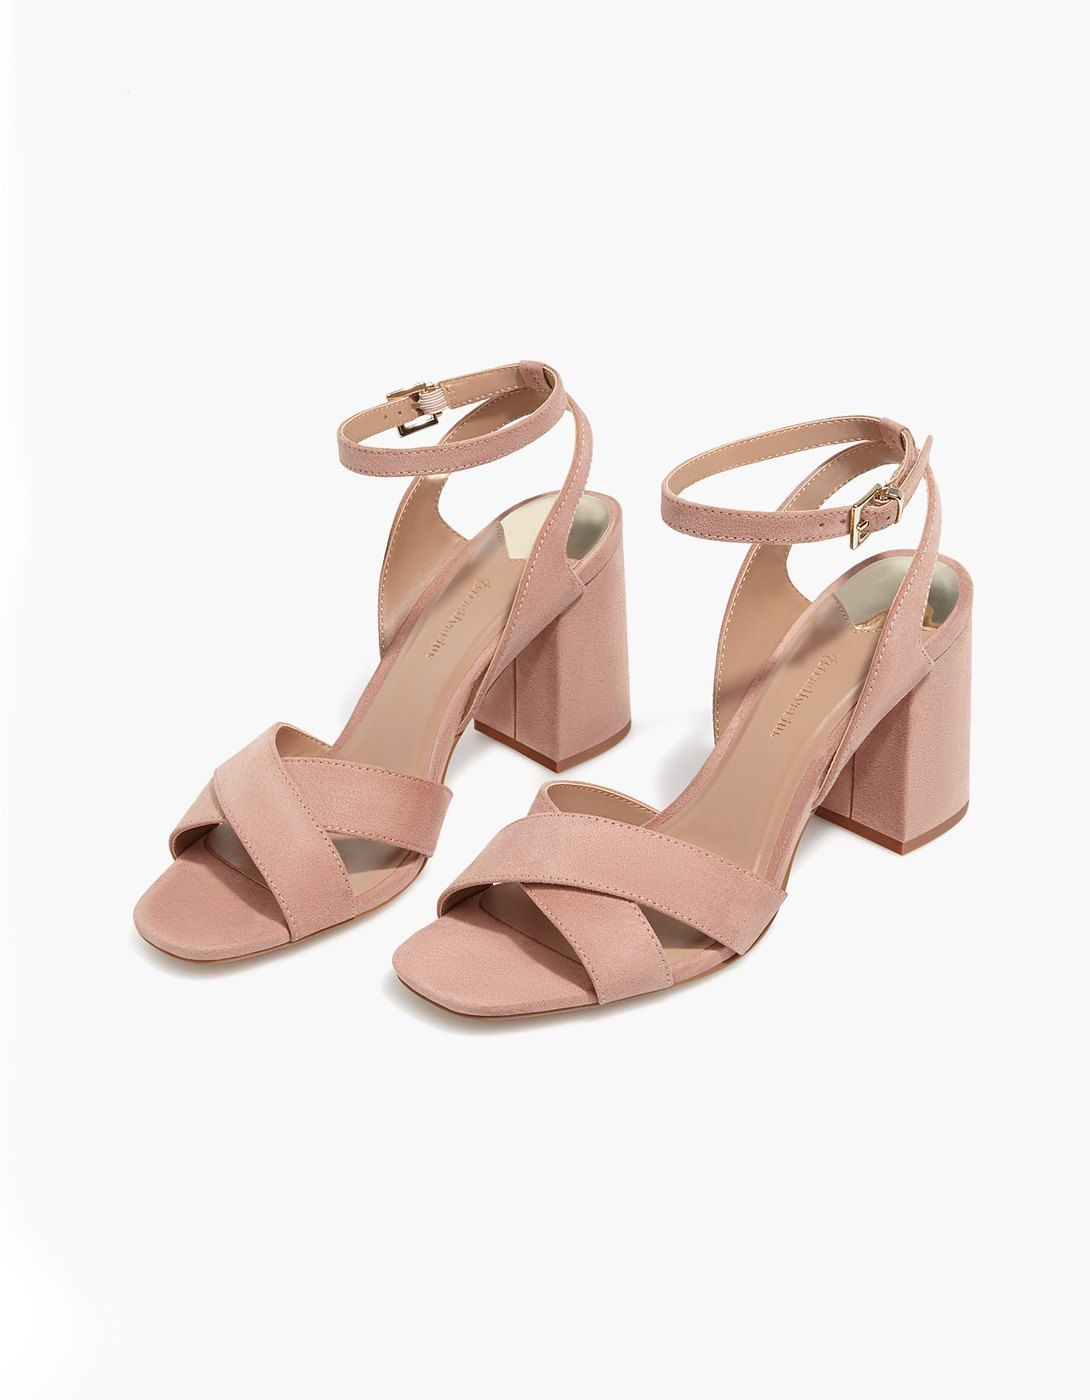 ToutesStradivarius Shoes Addict Sandale Talon Nude France IY7b6gfyv